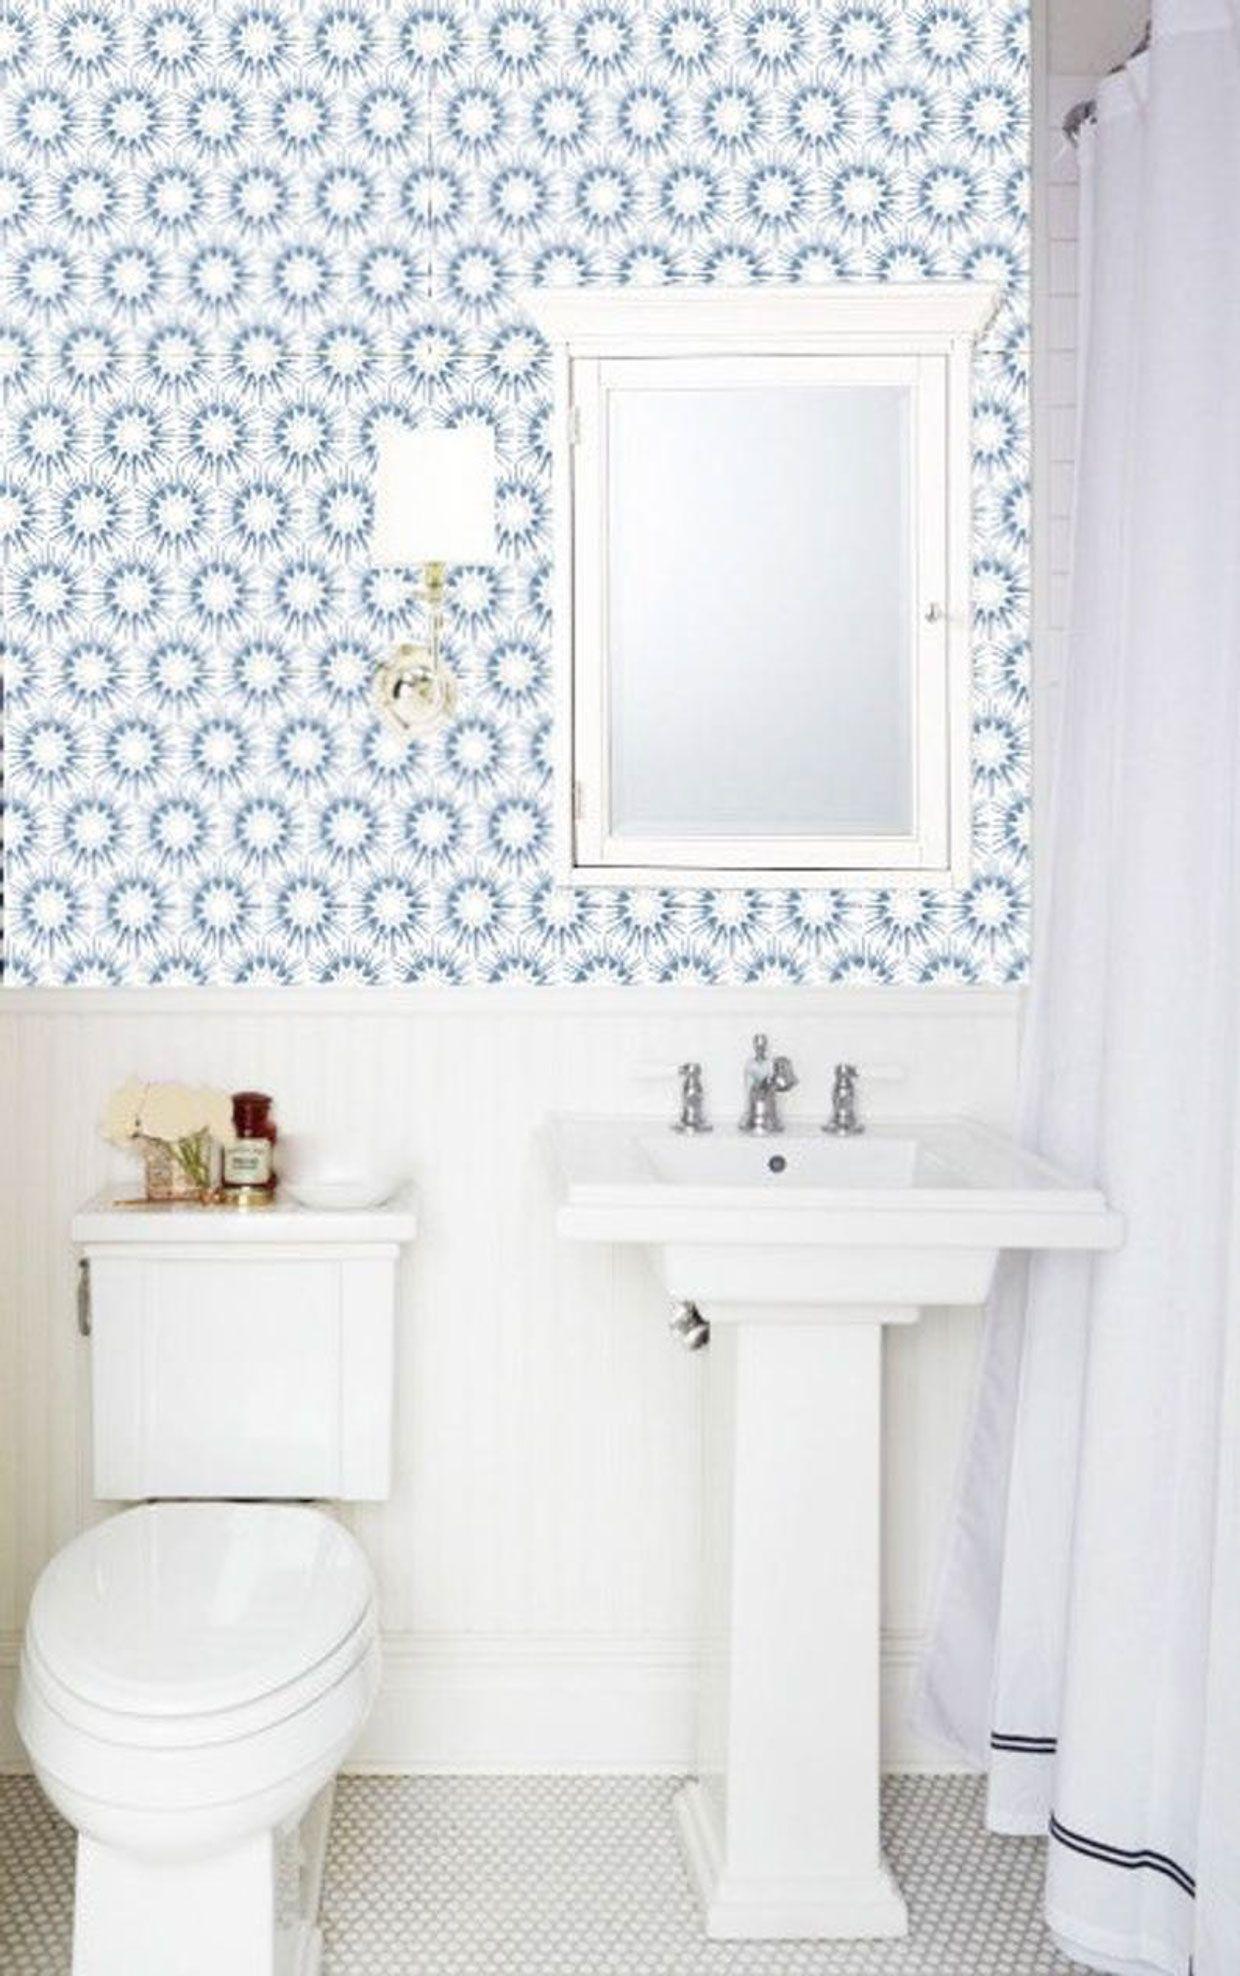 Small Bathroom Wallpaper Ideas Poor Little It Girl In 2020 Small Bathroom Wallpaper Bathroom Wallpaper Small Bathroom